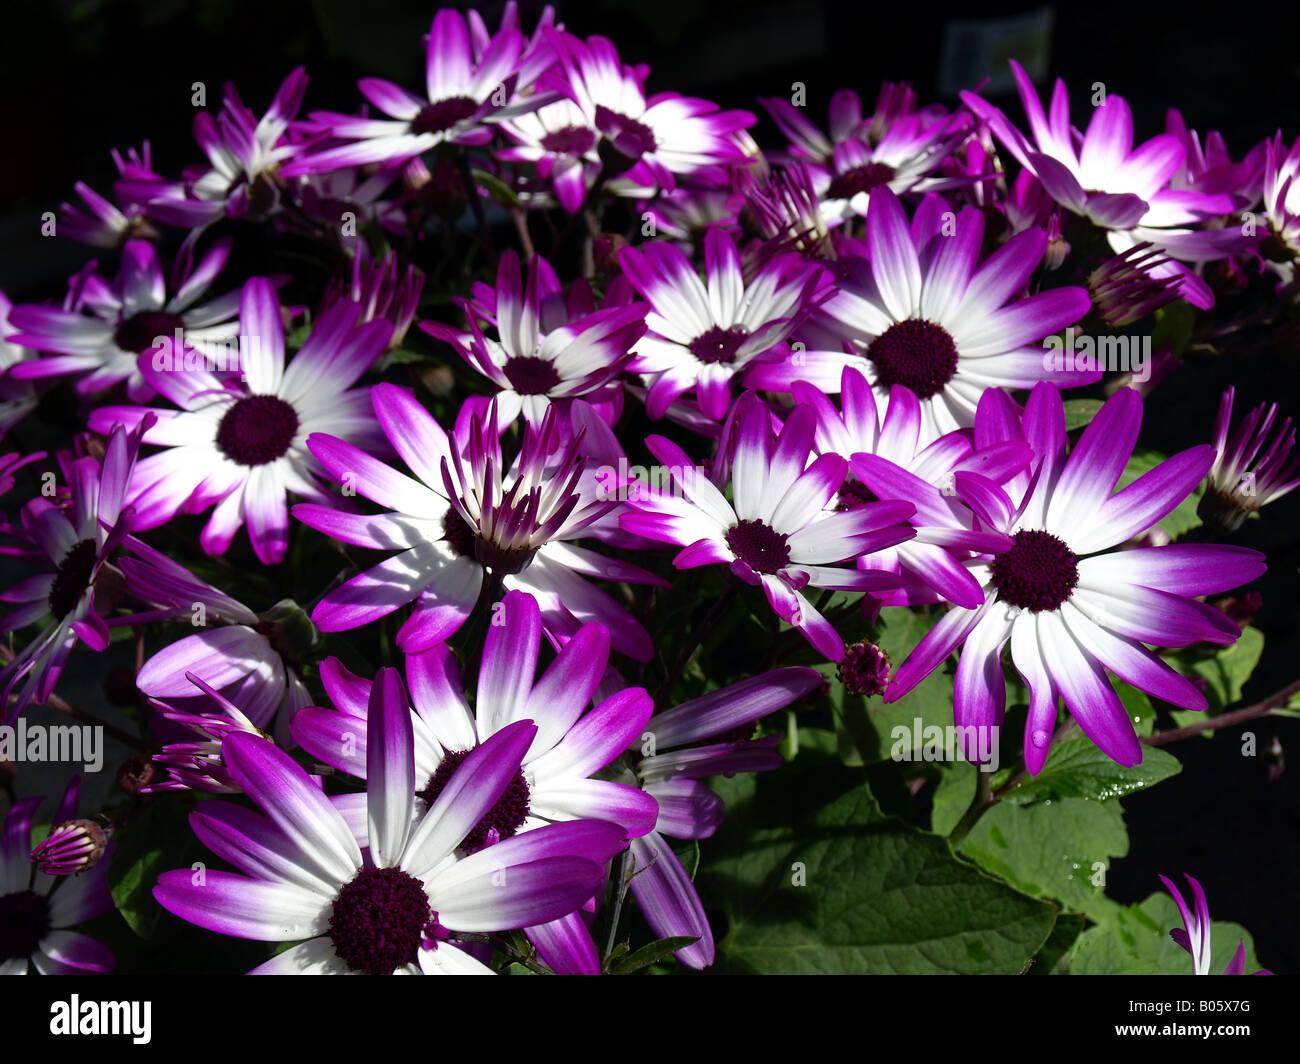 senetti magenta bicolour(pericallis) in flower - Stock Image